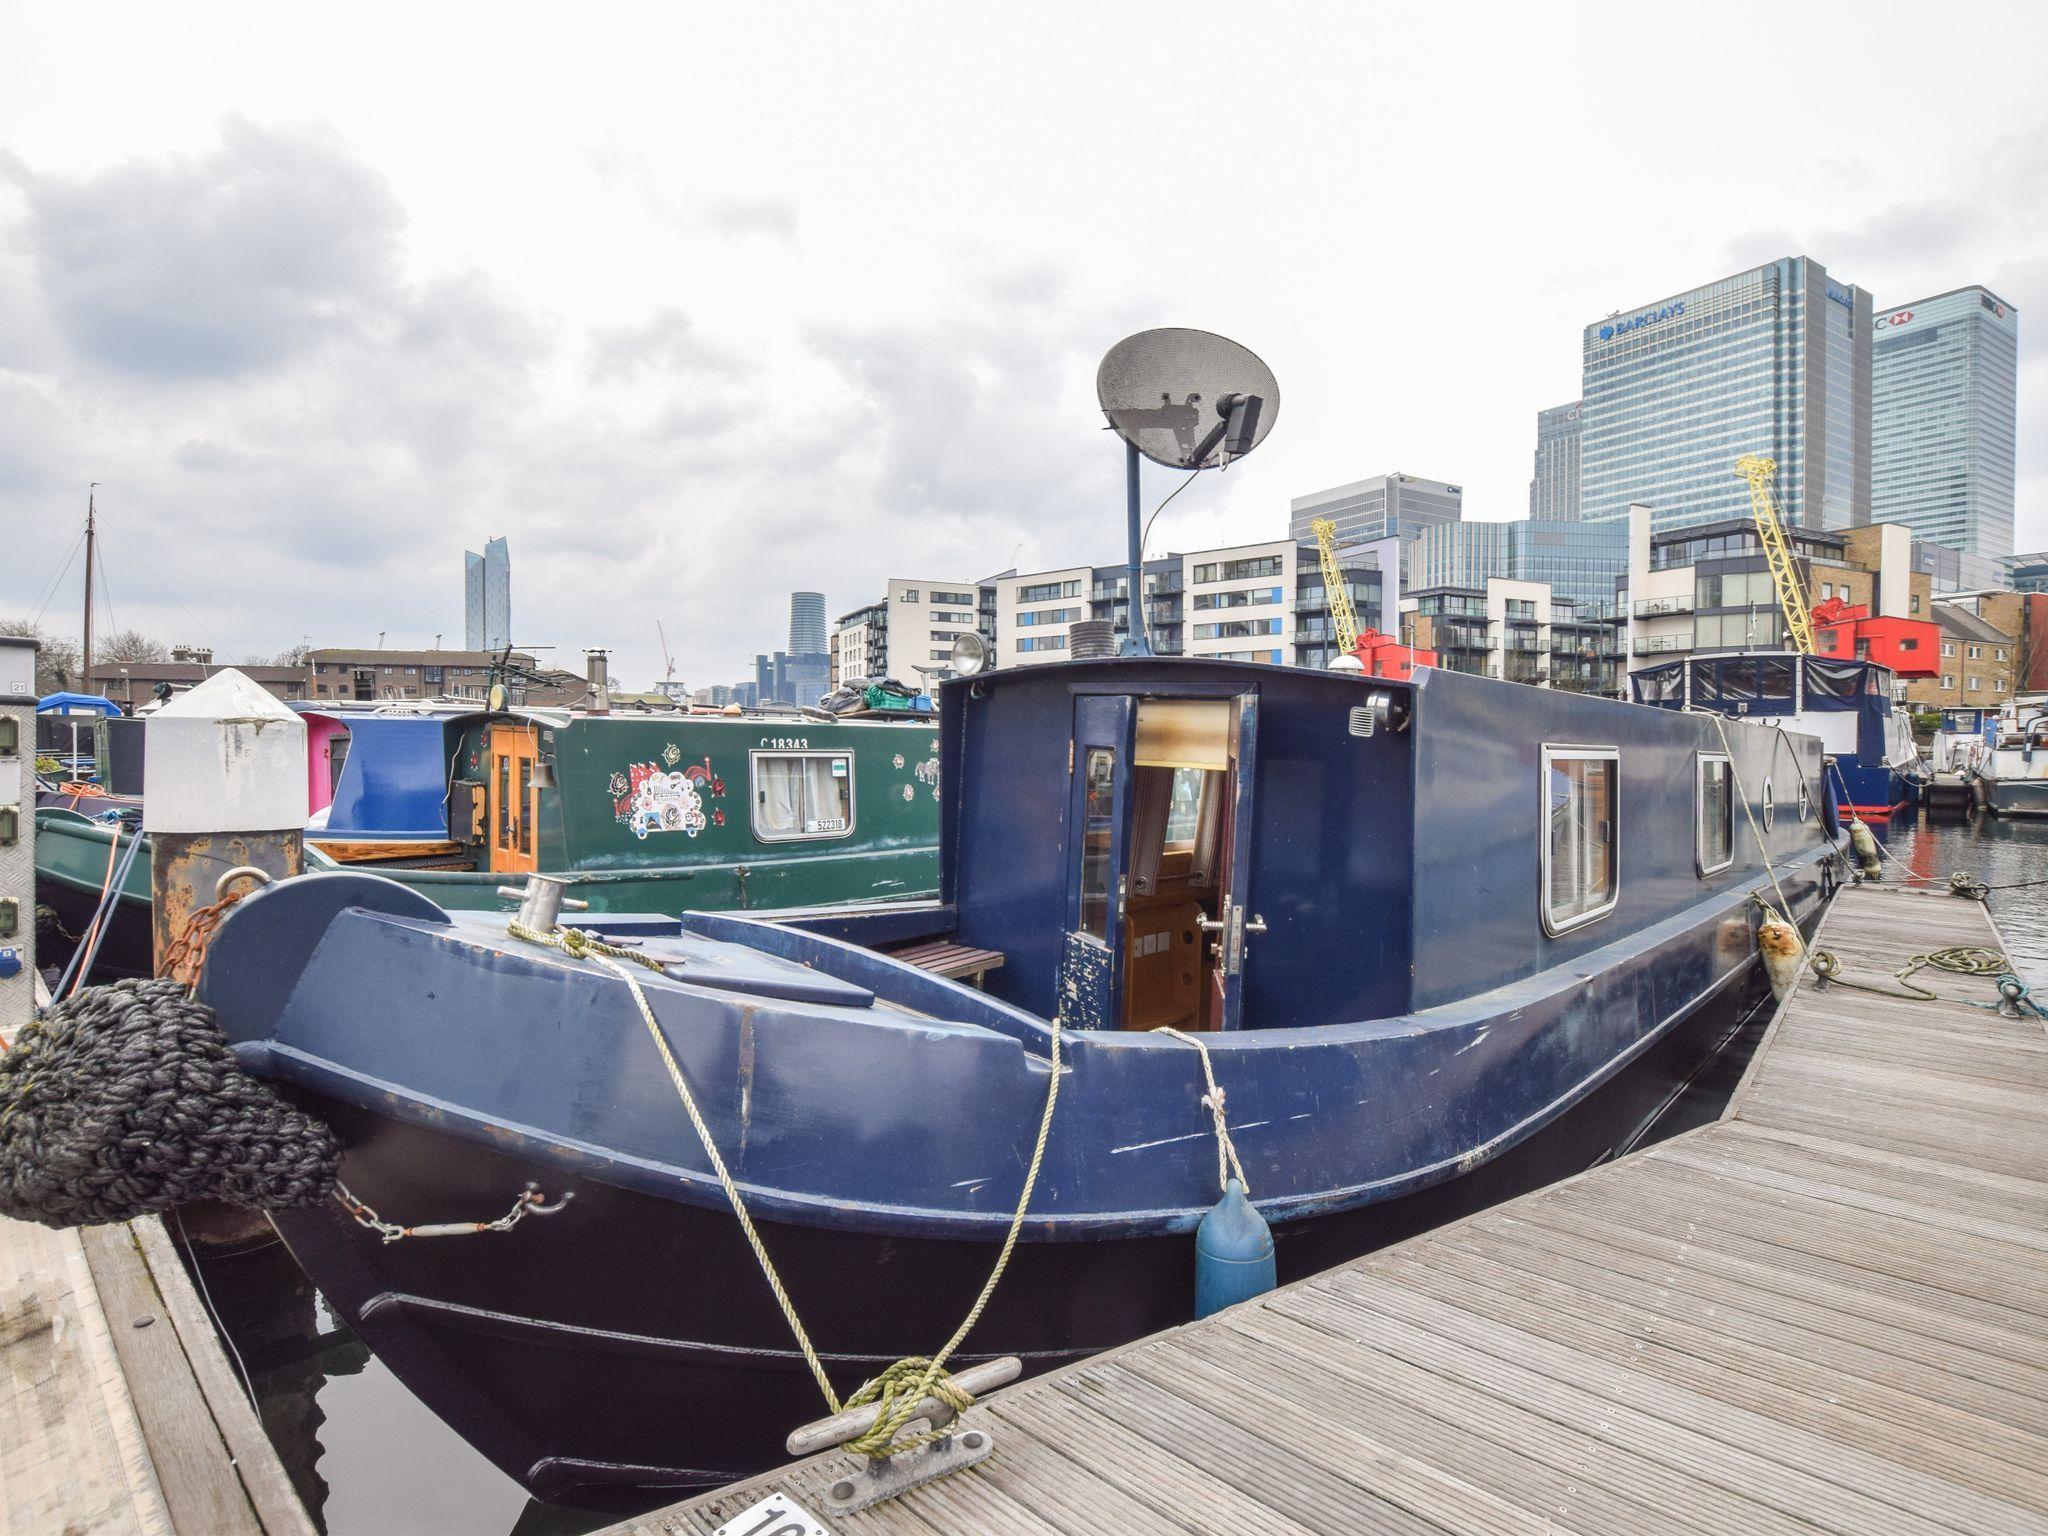 Narrowboat 39ft with London mooring